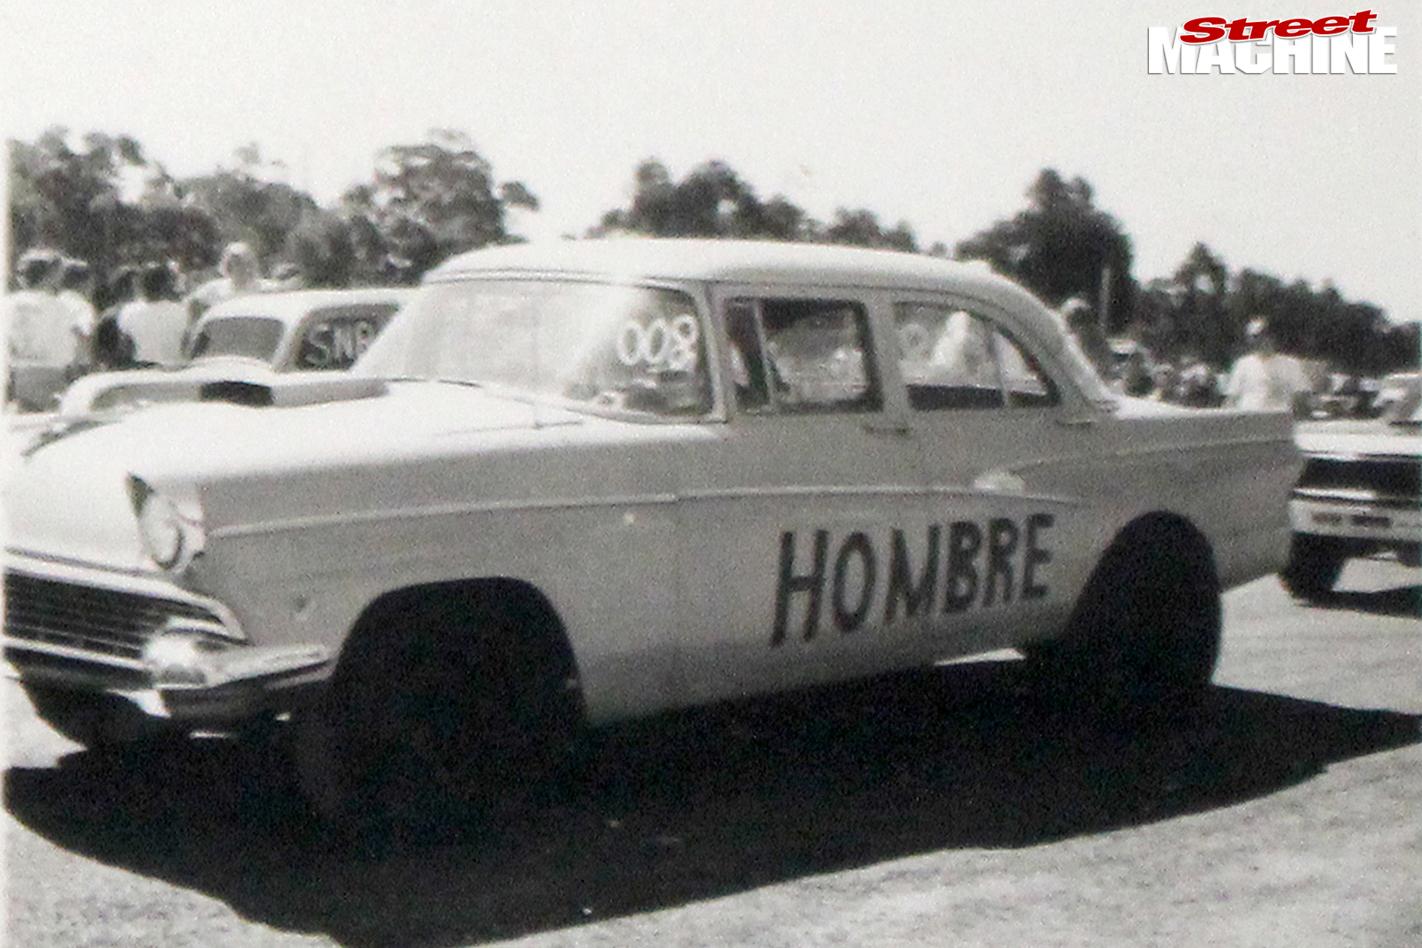 4-hombre -1956-cusso